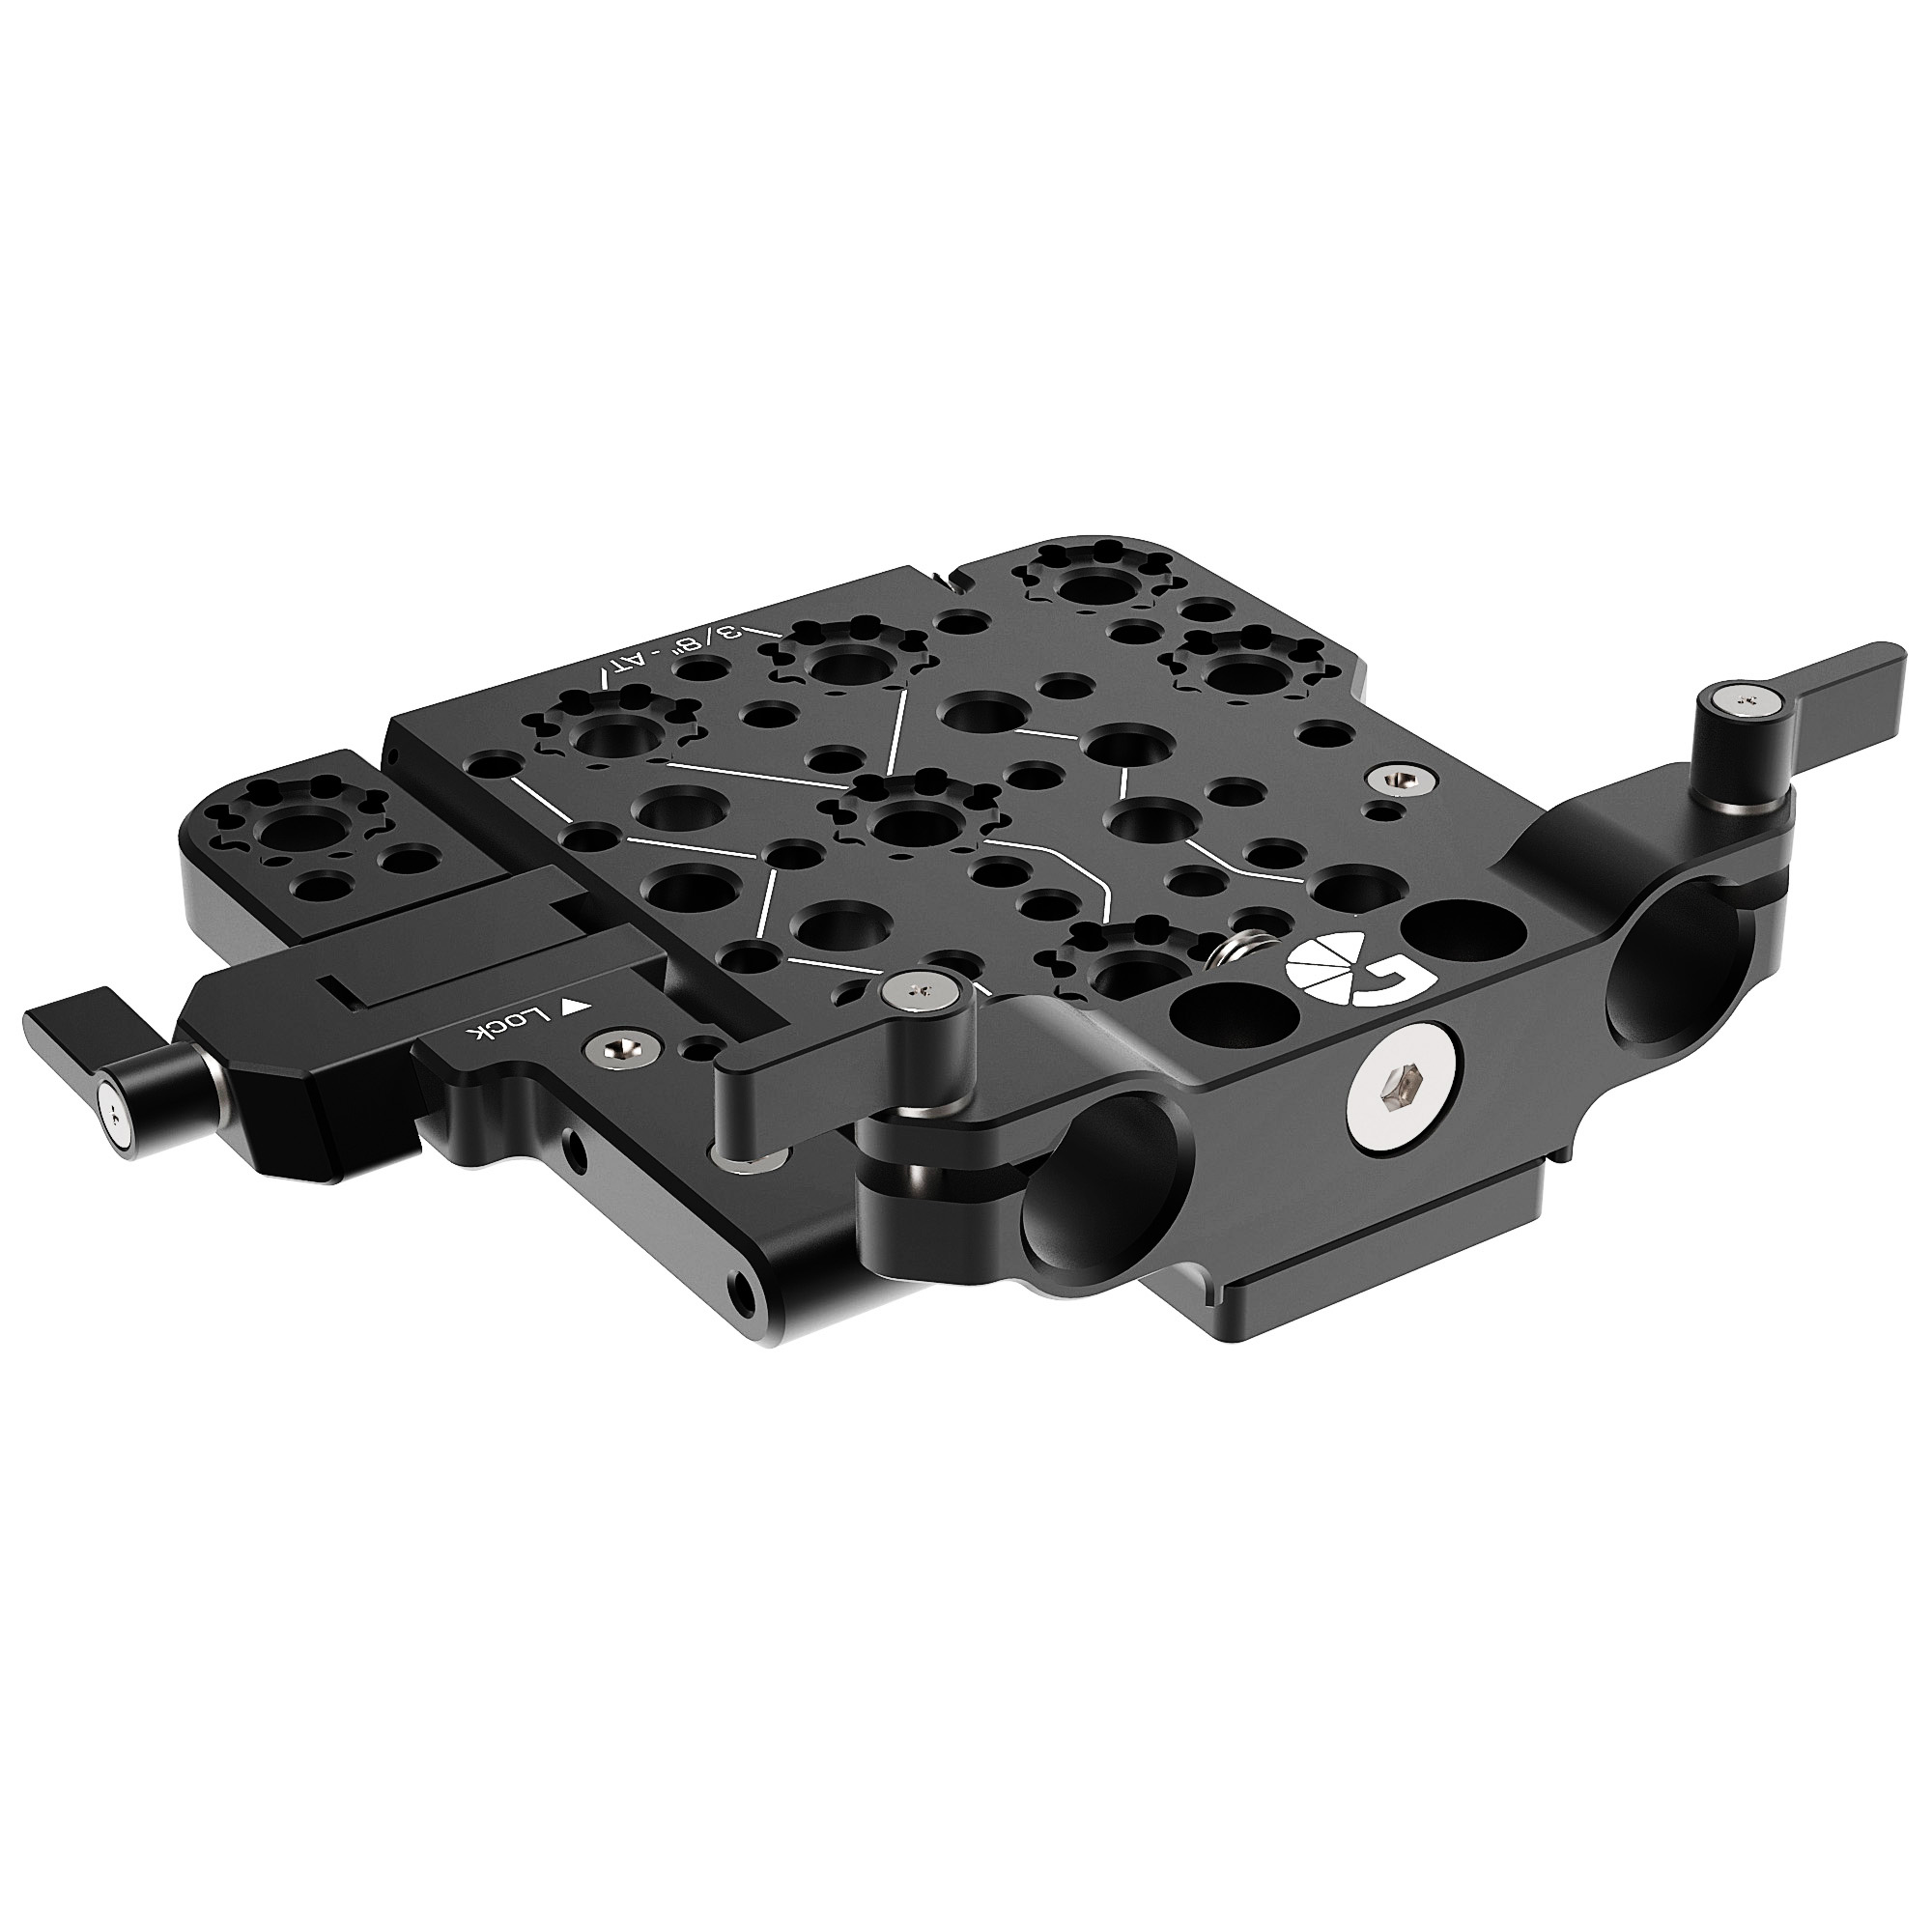 B4001.0004 Alexa Mini Left Field Sliding Top Plate 2